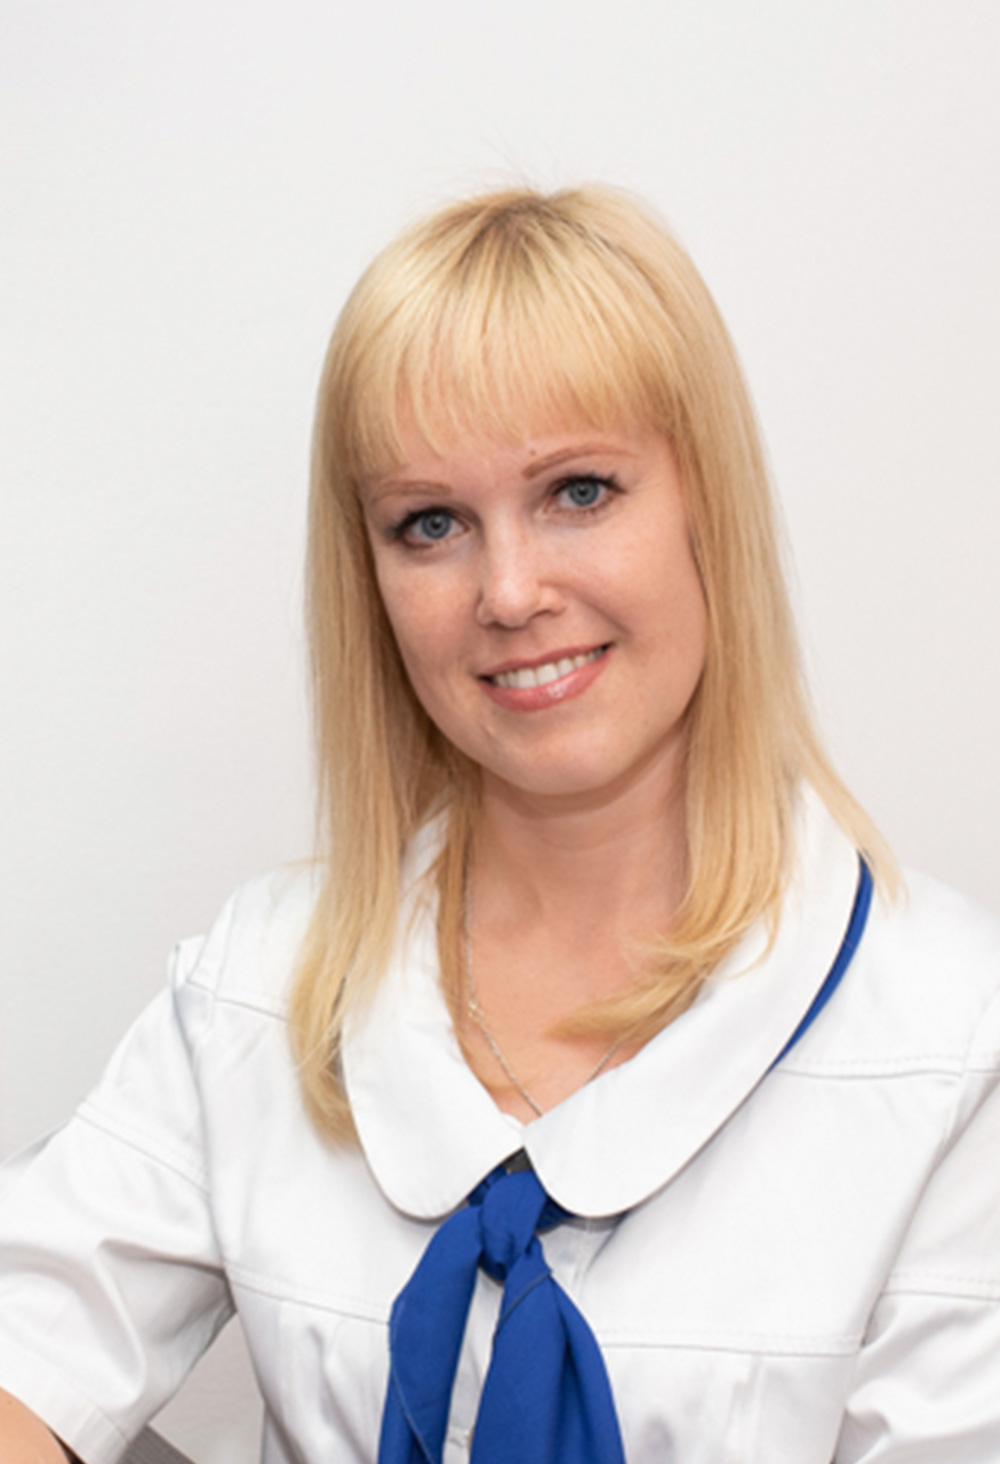 Julia Pugach